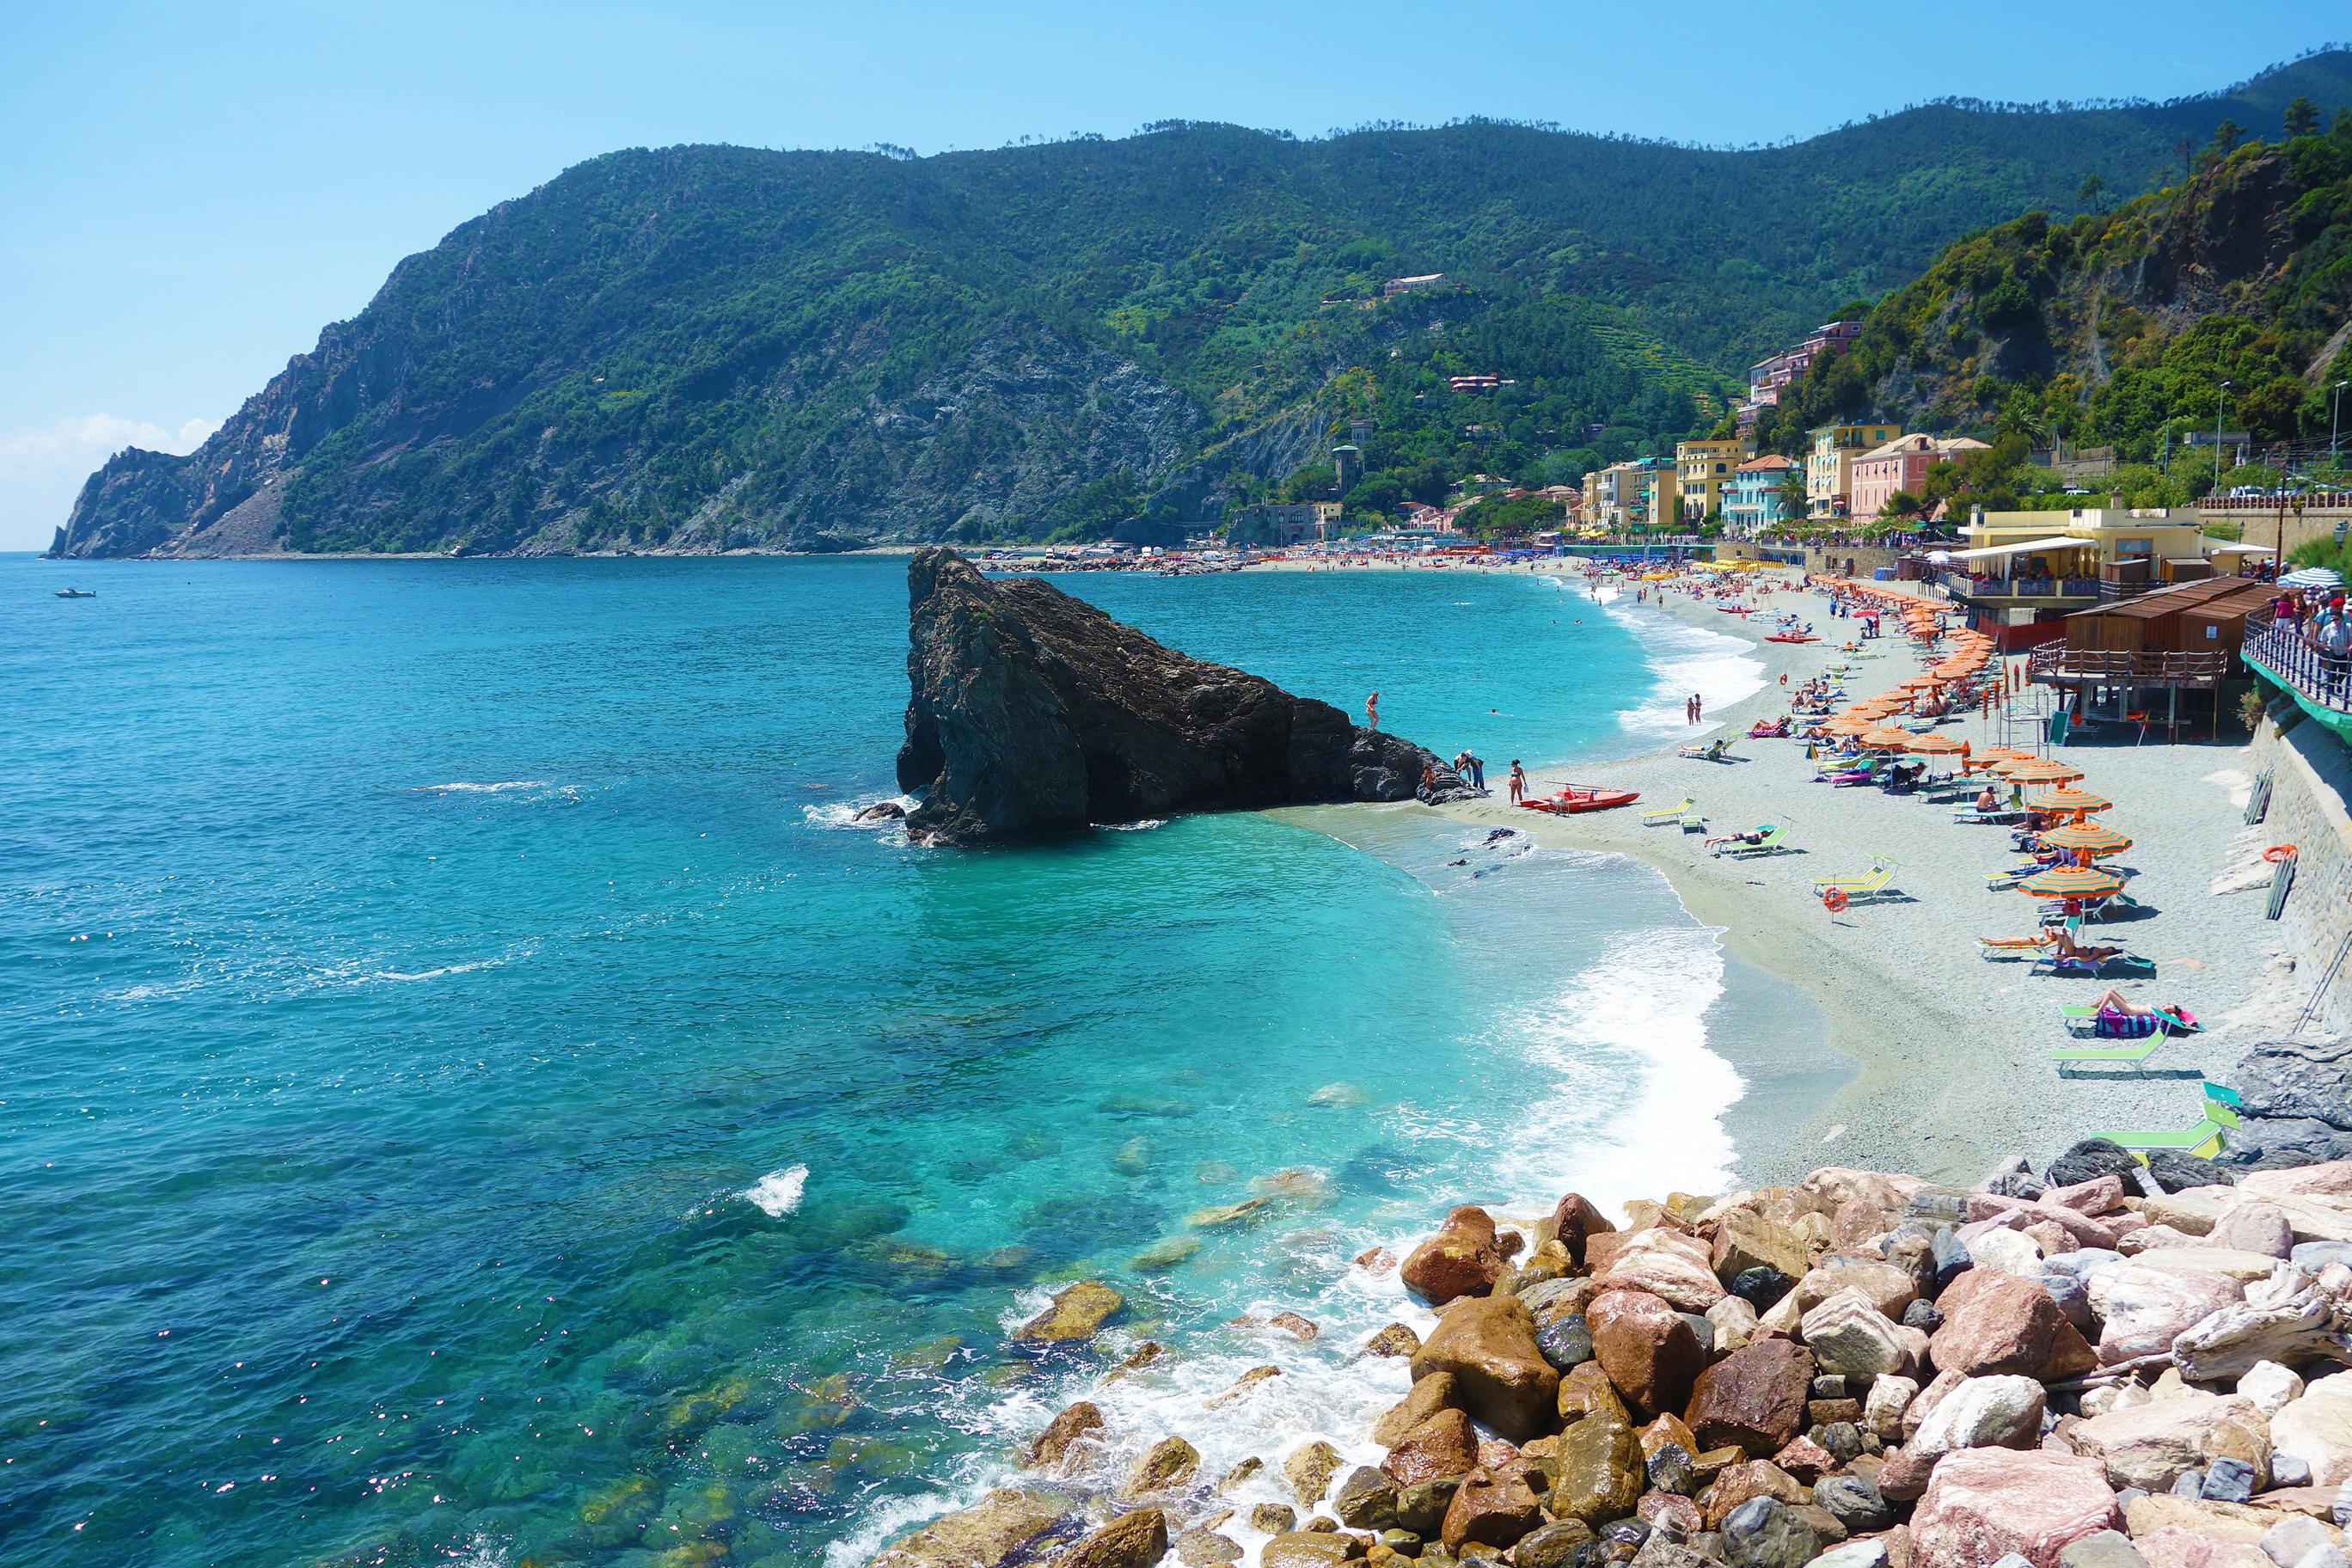 The Heart Of Cinque Terre cinque terre beach life   beach lover's diary